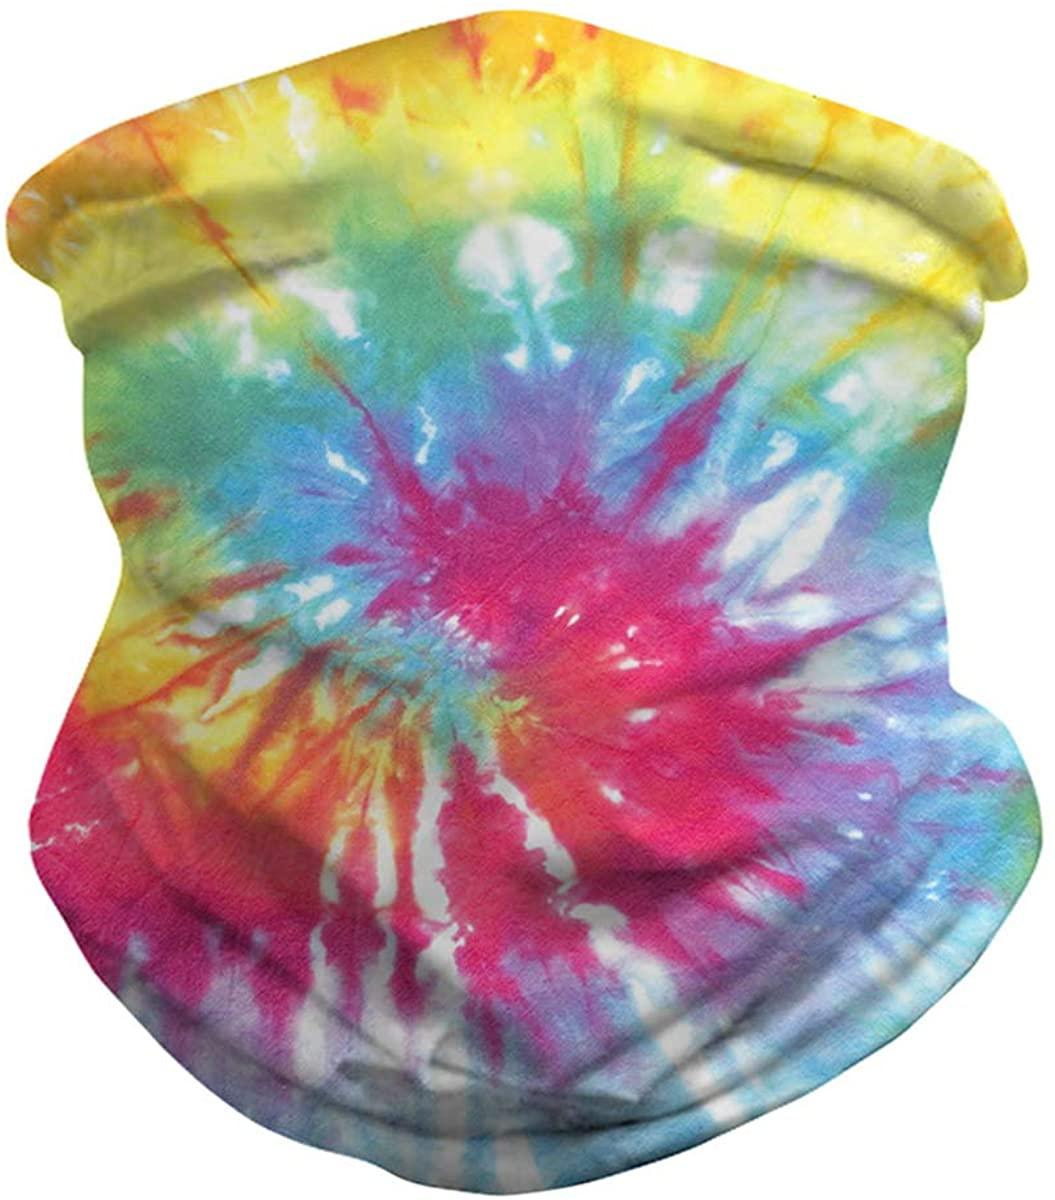 Unisex Face Bandana Seamless Galaxy Tie Dye Neck Gaiter Scarf Sun UV Protection Headwear Women Men Balaclava for Dust Sports